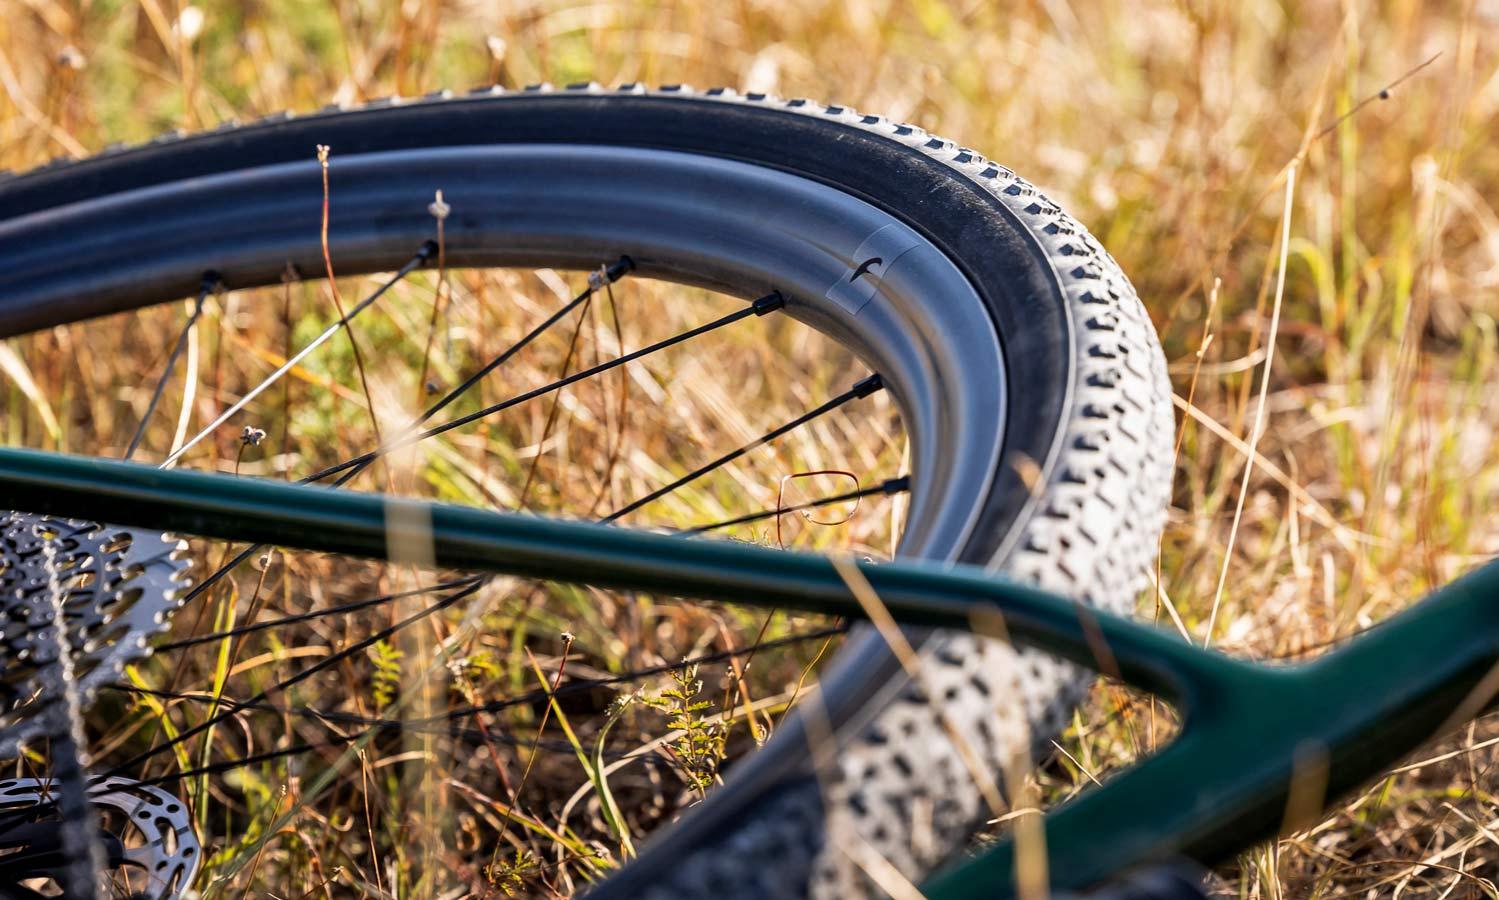 Fulcrum Rapid Red Carbon lightweight asymmetric tubeless gravel bike wheels,detail